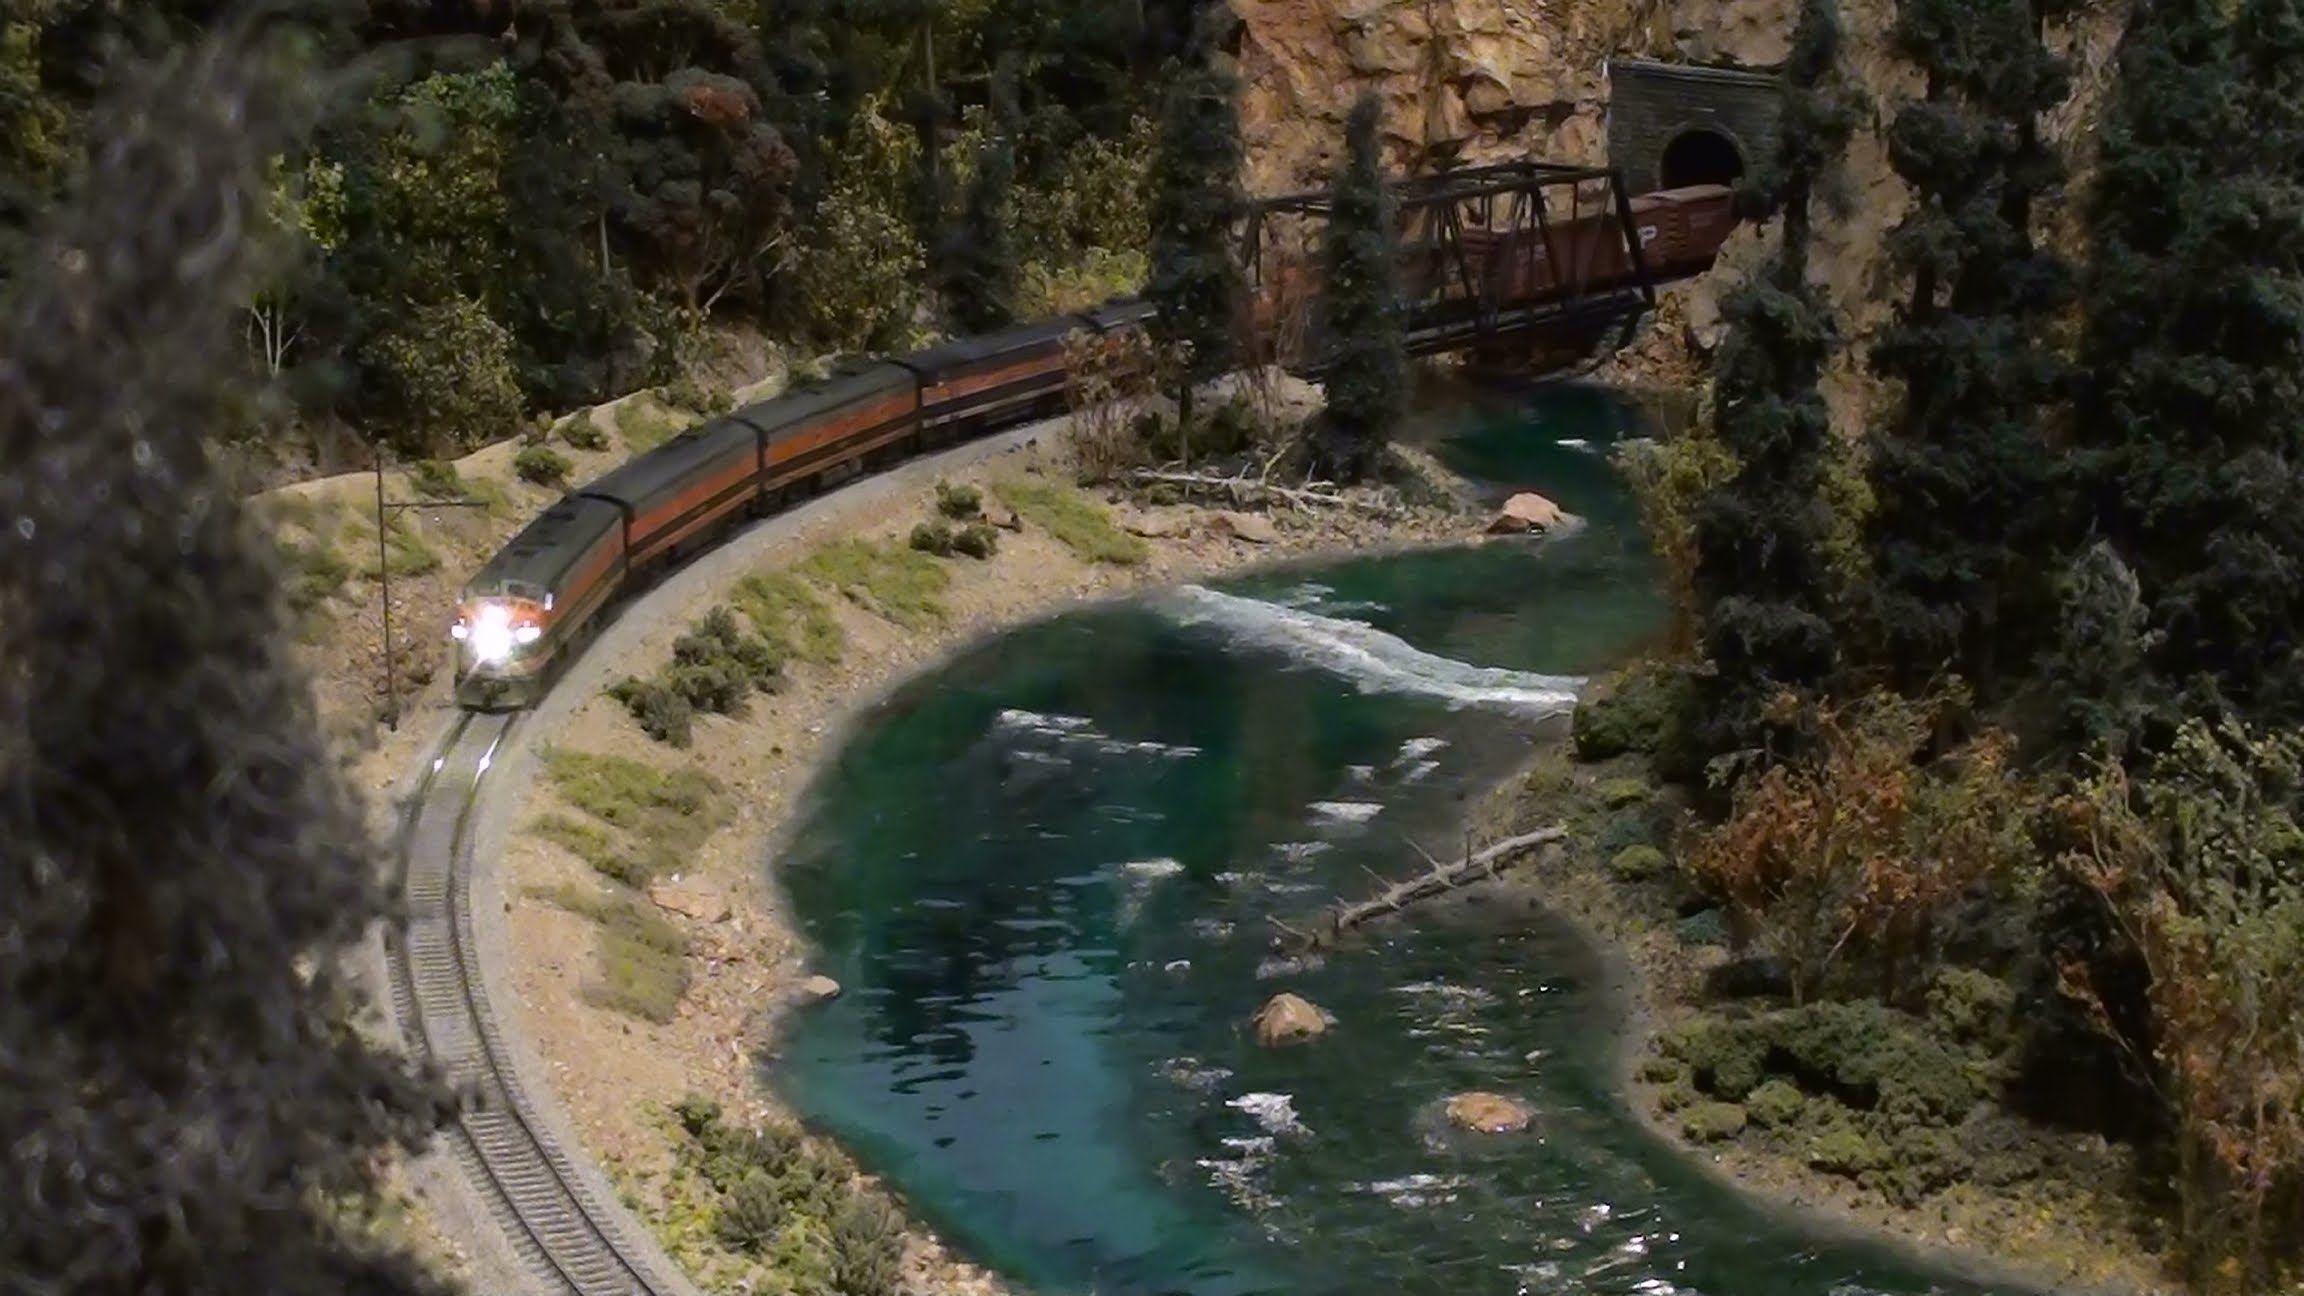 realistic model train layouts - Google Search